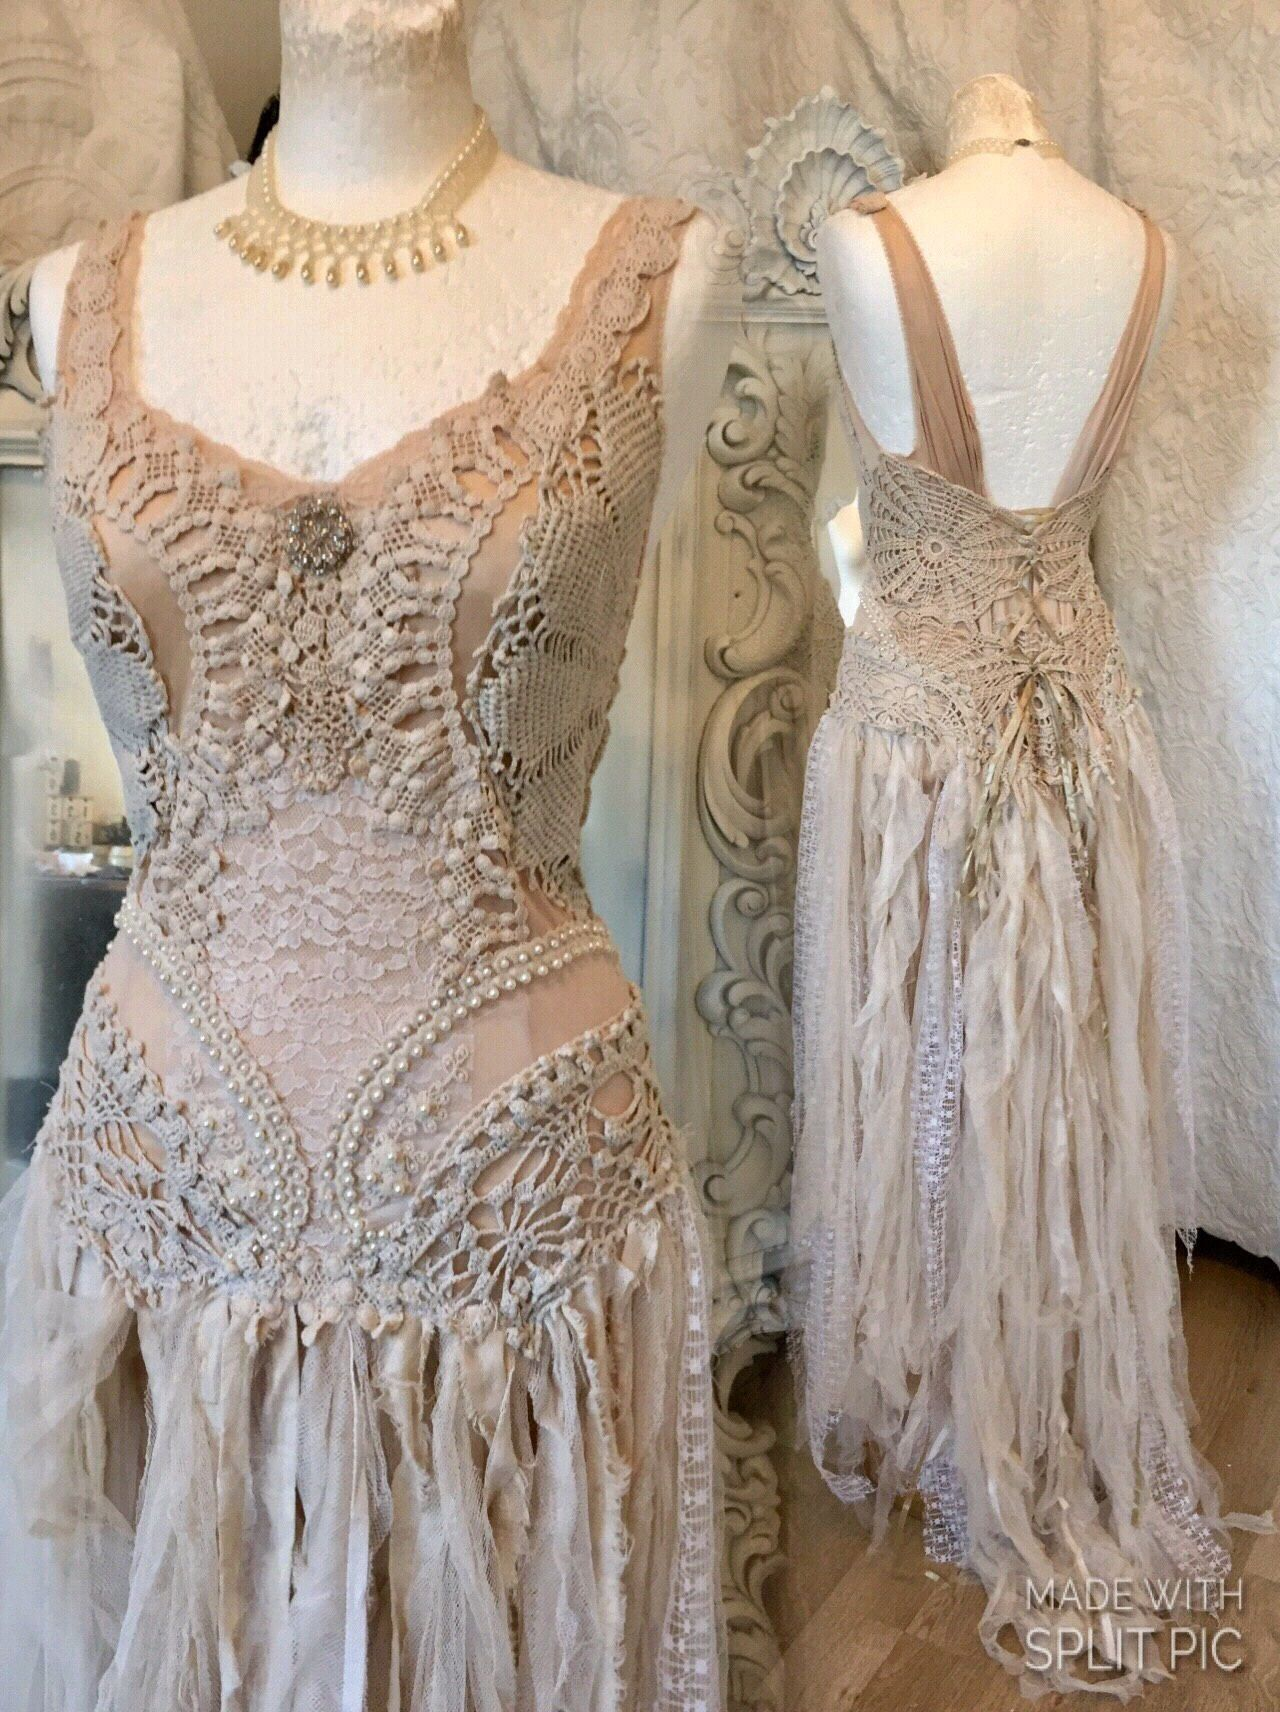 Boho wedding dress misty blushalternative wedding dress tea stained